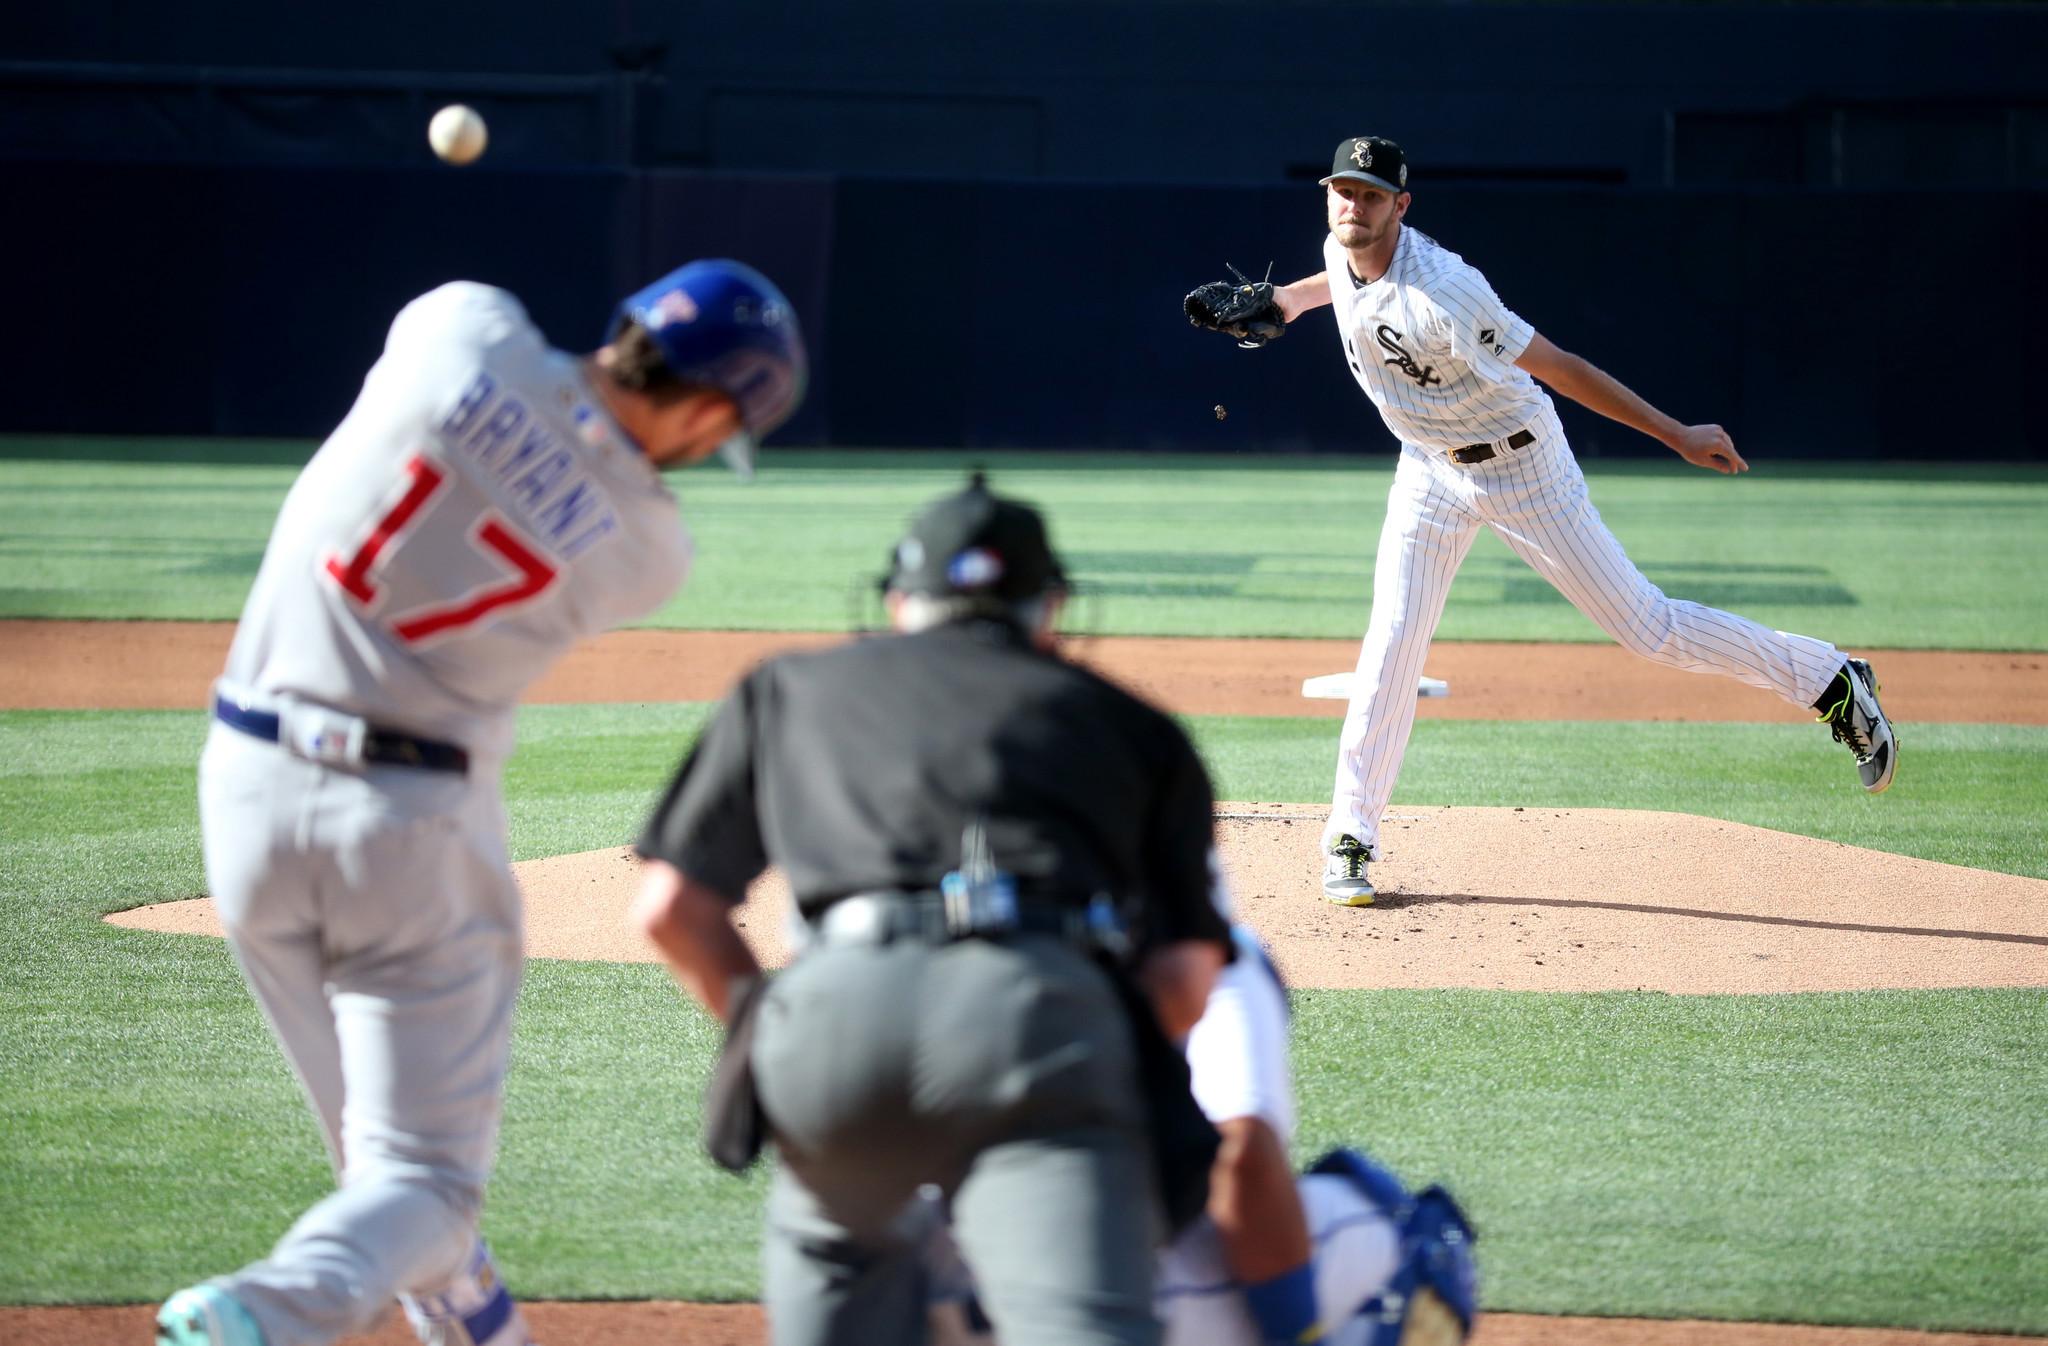 Ct-predictions-baseball-preview-2017-spt-0402-20170331